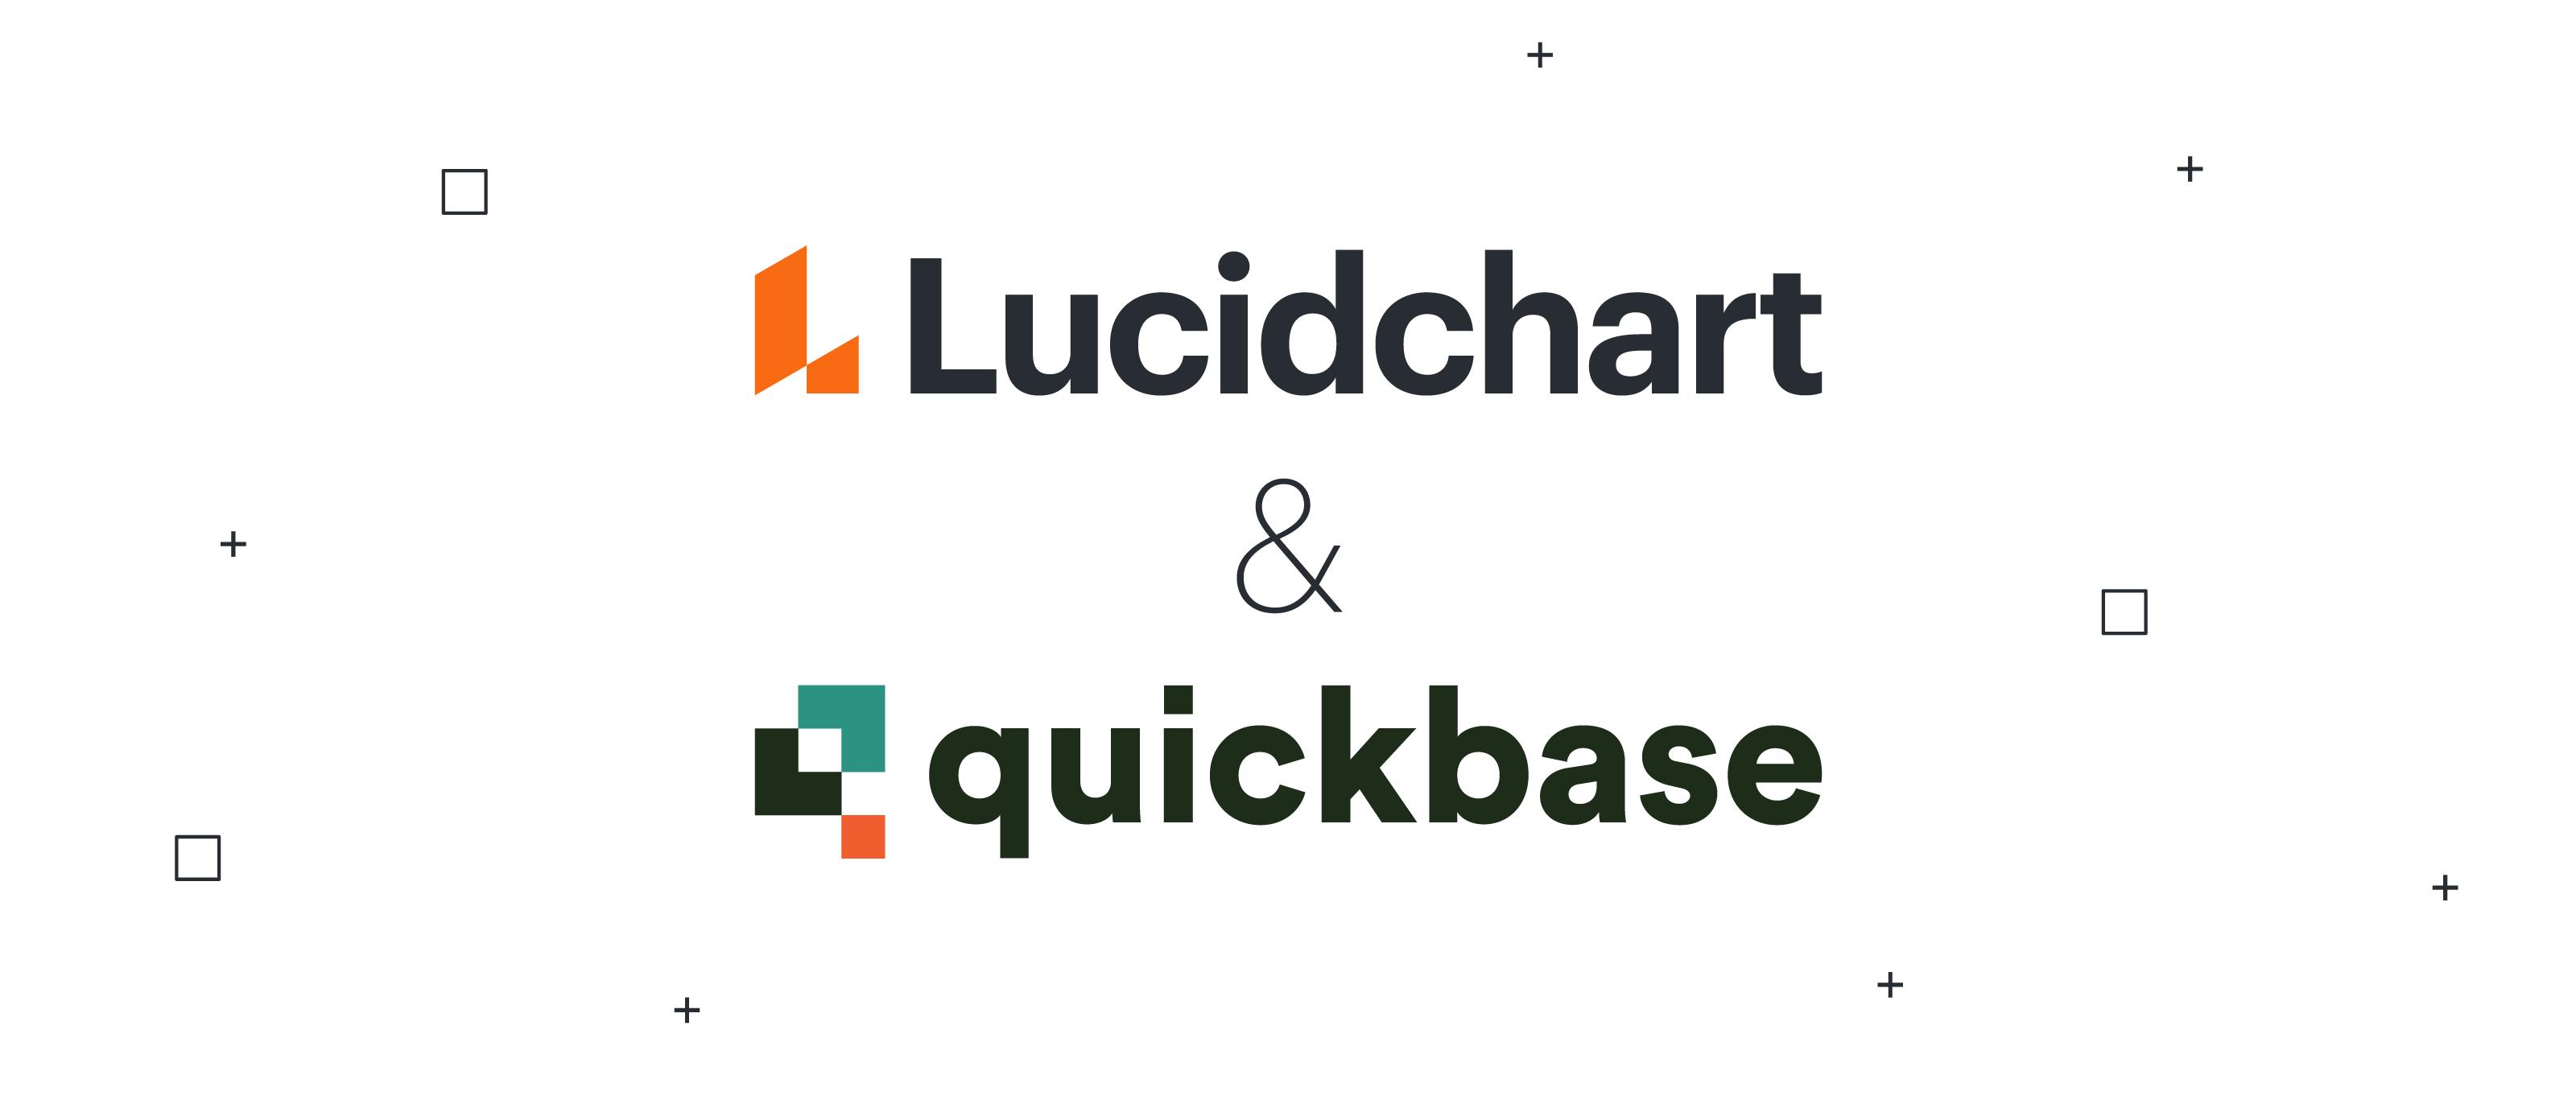 Lucidchart and Quickbase integration